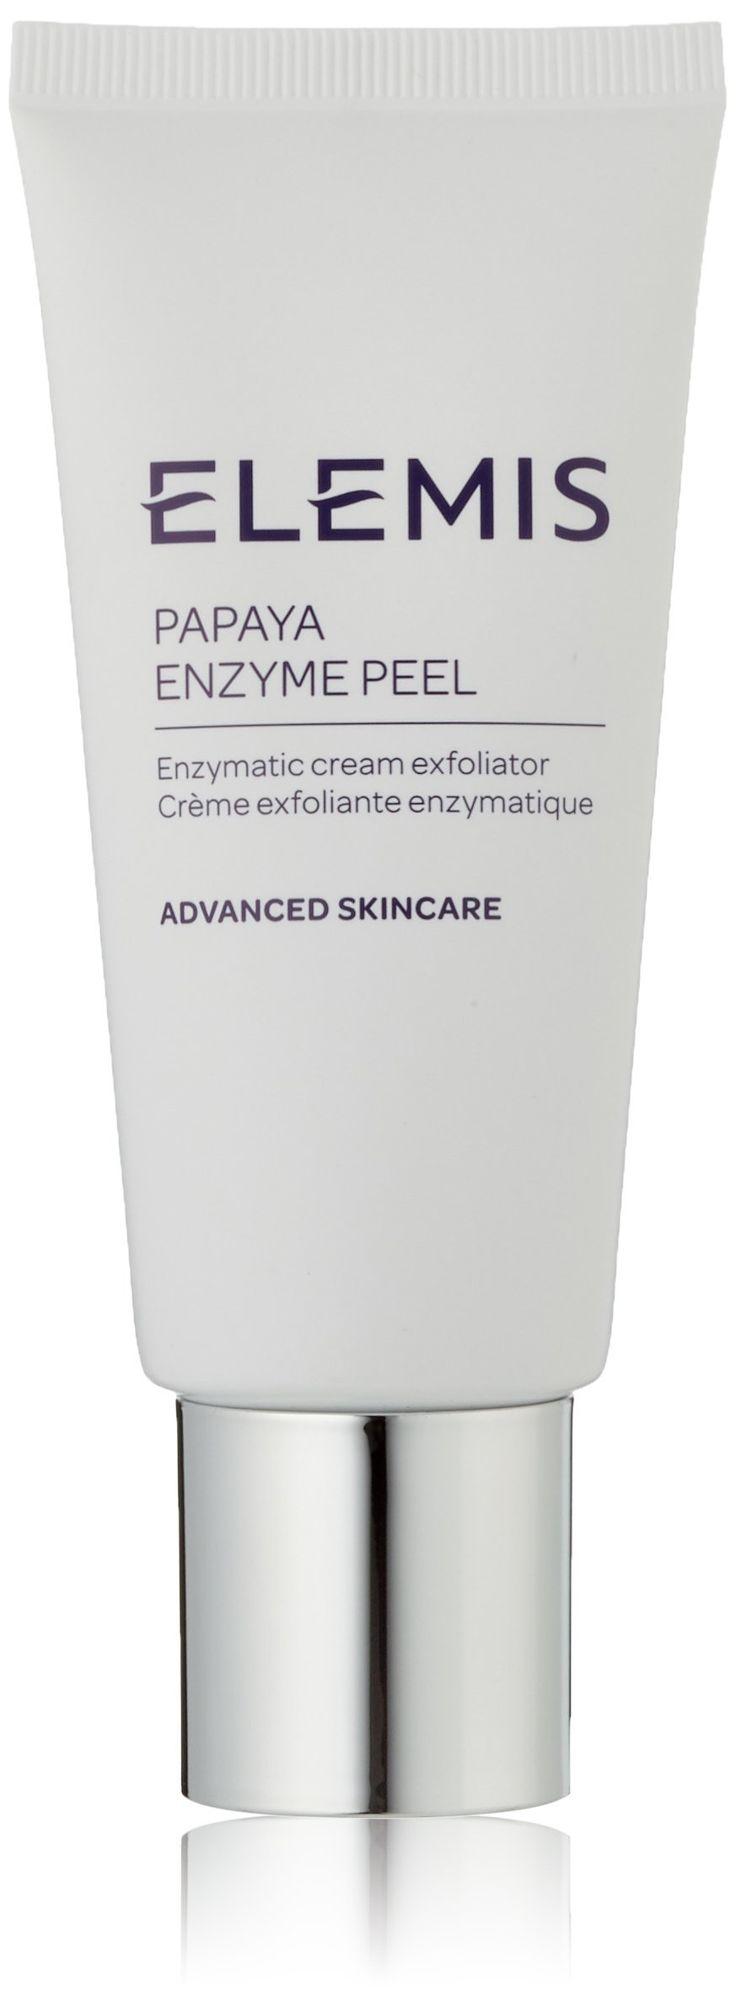 ELEMIS Papaya Enzyme Peel, 1.6 fl.oz.